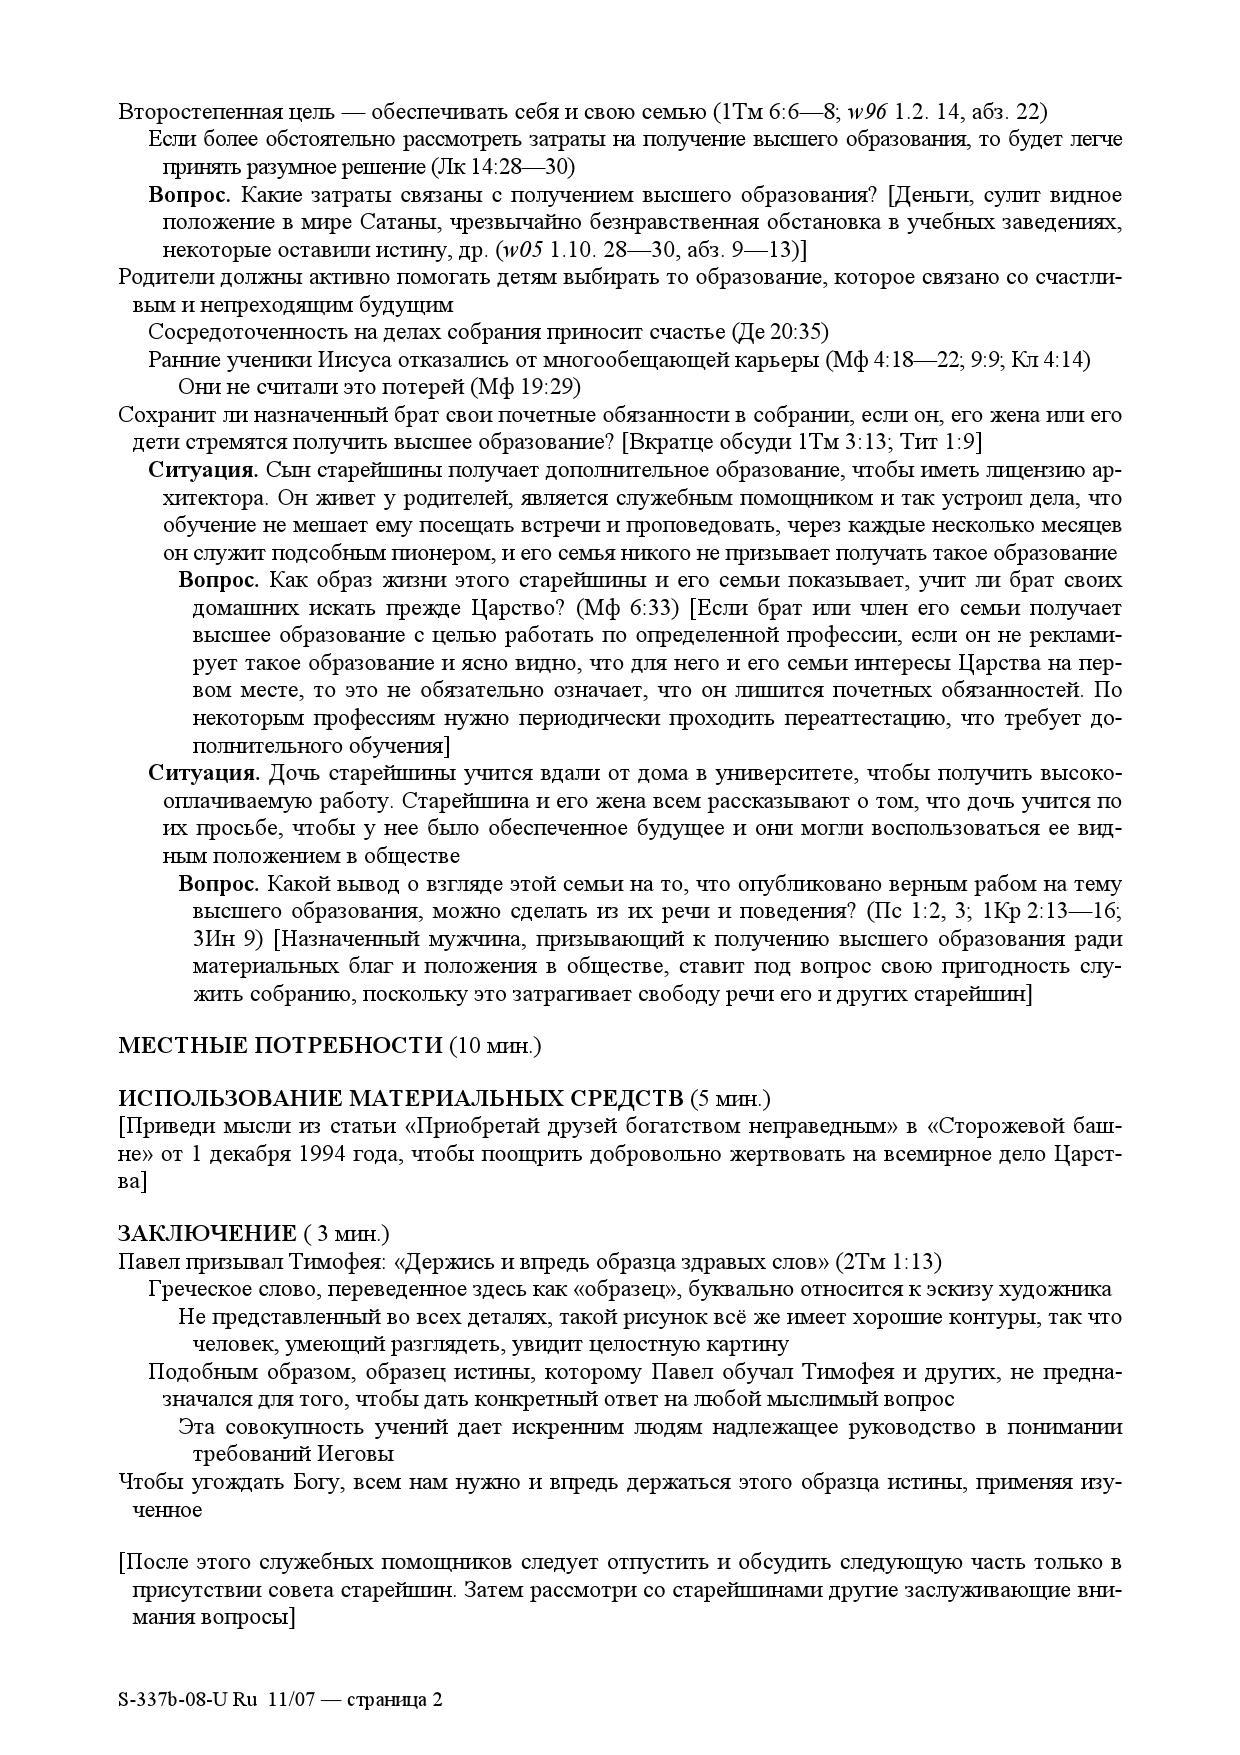 S-337-U-11-07 (ВО, брак СИ, растление-назначение)_000002